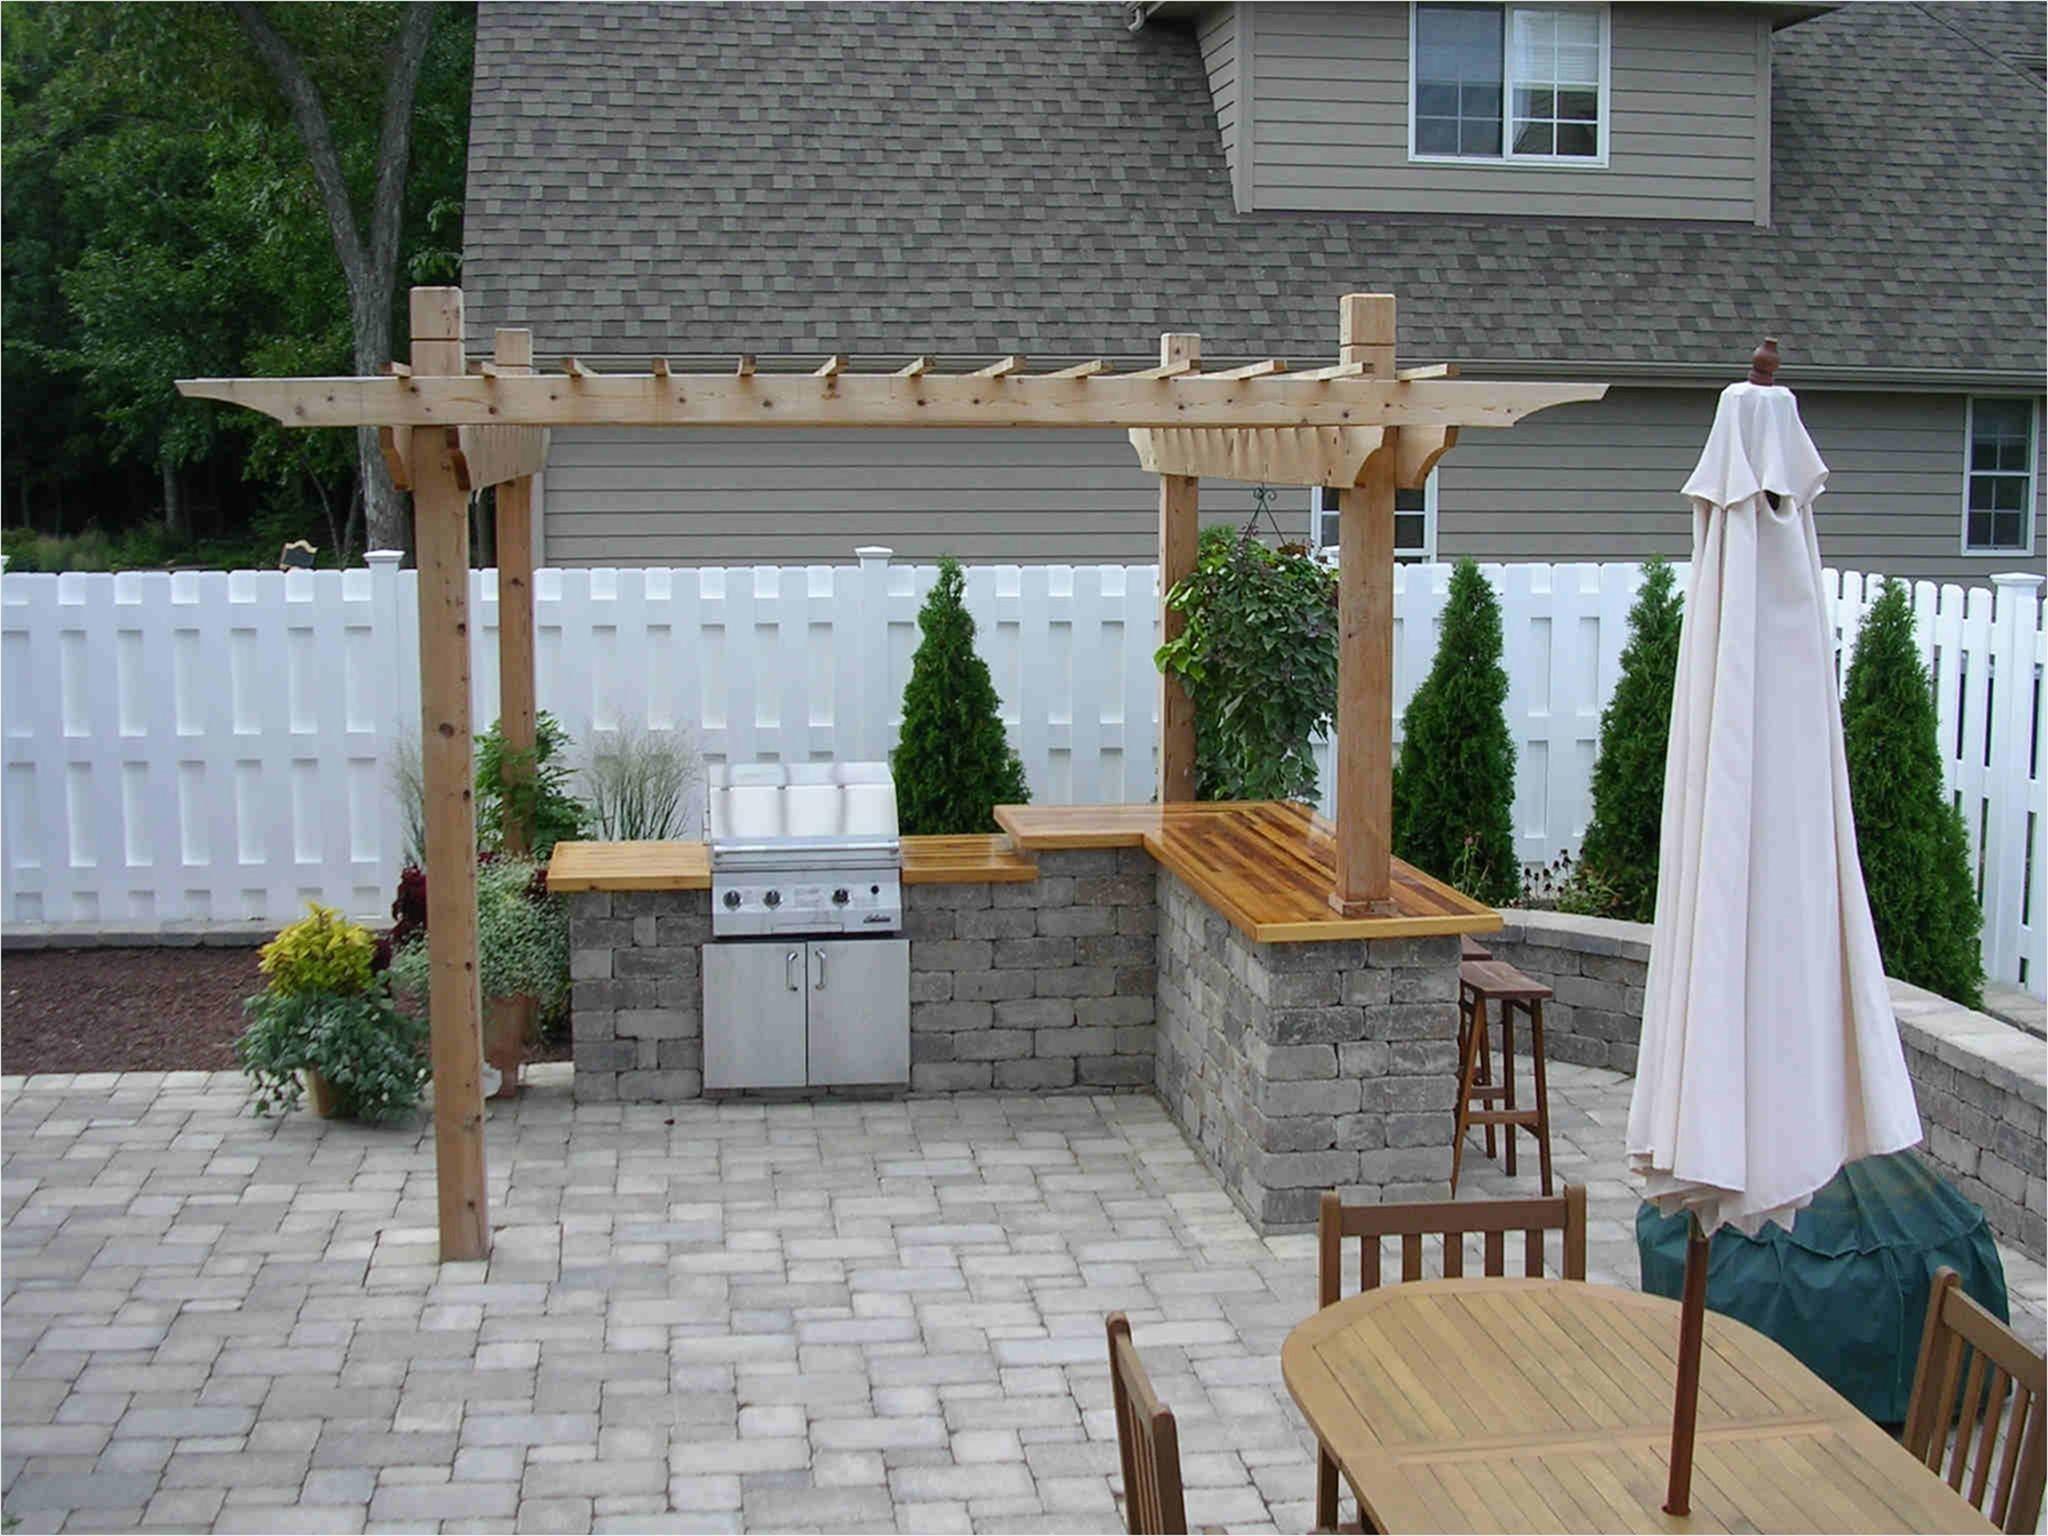 10 gorgeous diy outdoor kitchen designs on a budget outdoor kitchen plans outdoor kitchen on outdoor kitchen ideas on a budget id=97746